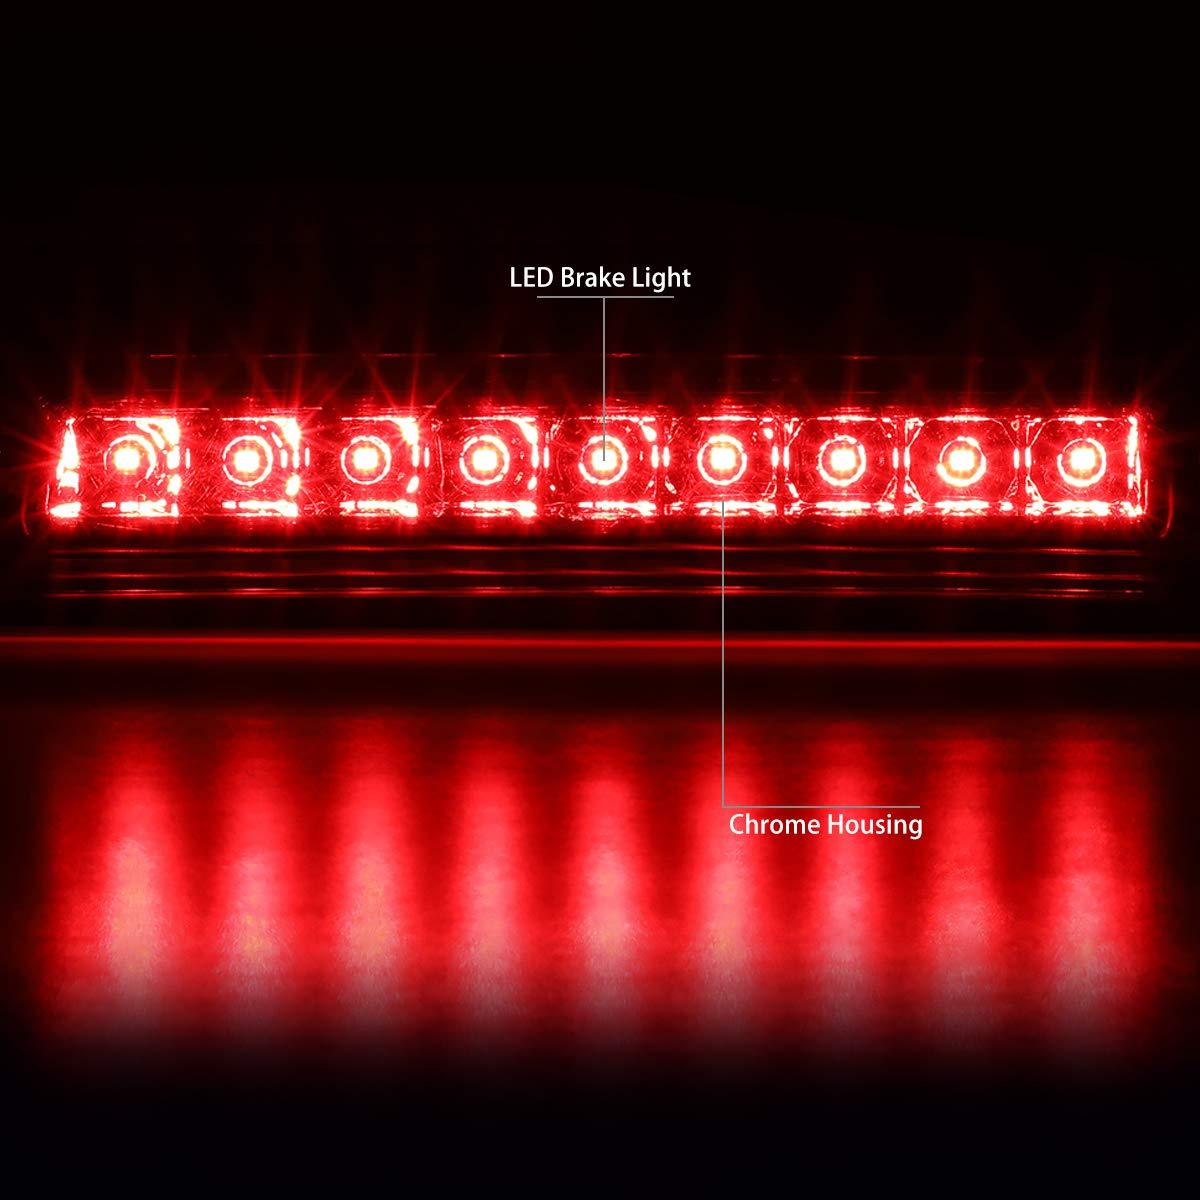 DNA Motoring 3BL-HRID06-LED-CH Rear Center High Mount Full LED 3rd Tail Brake Light Replacement